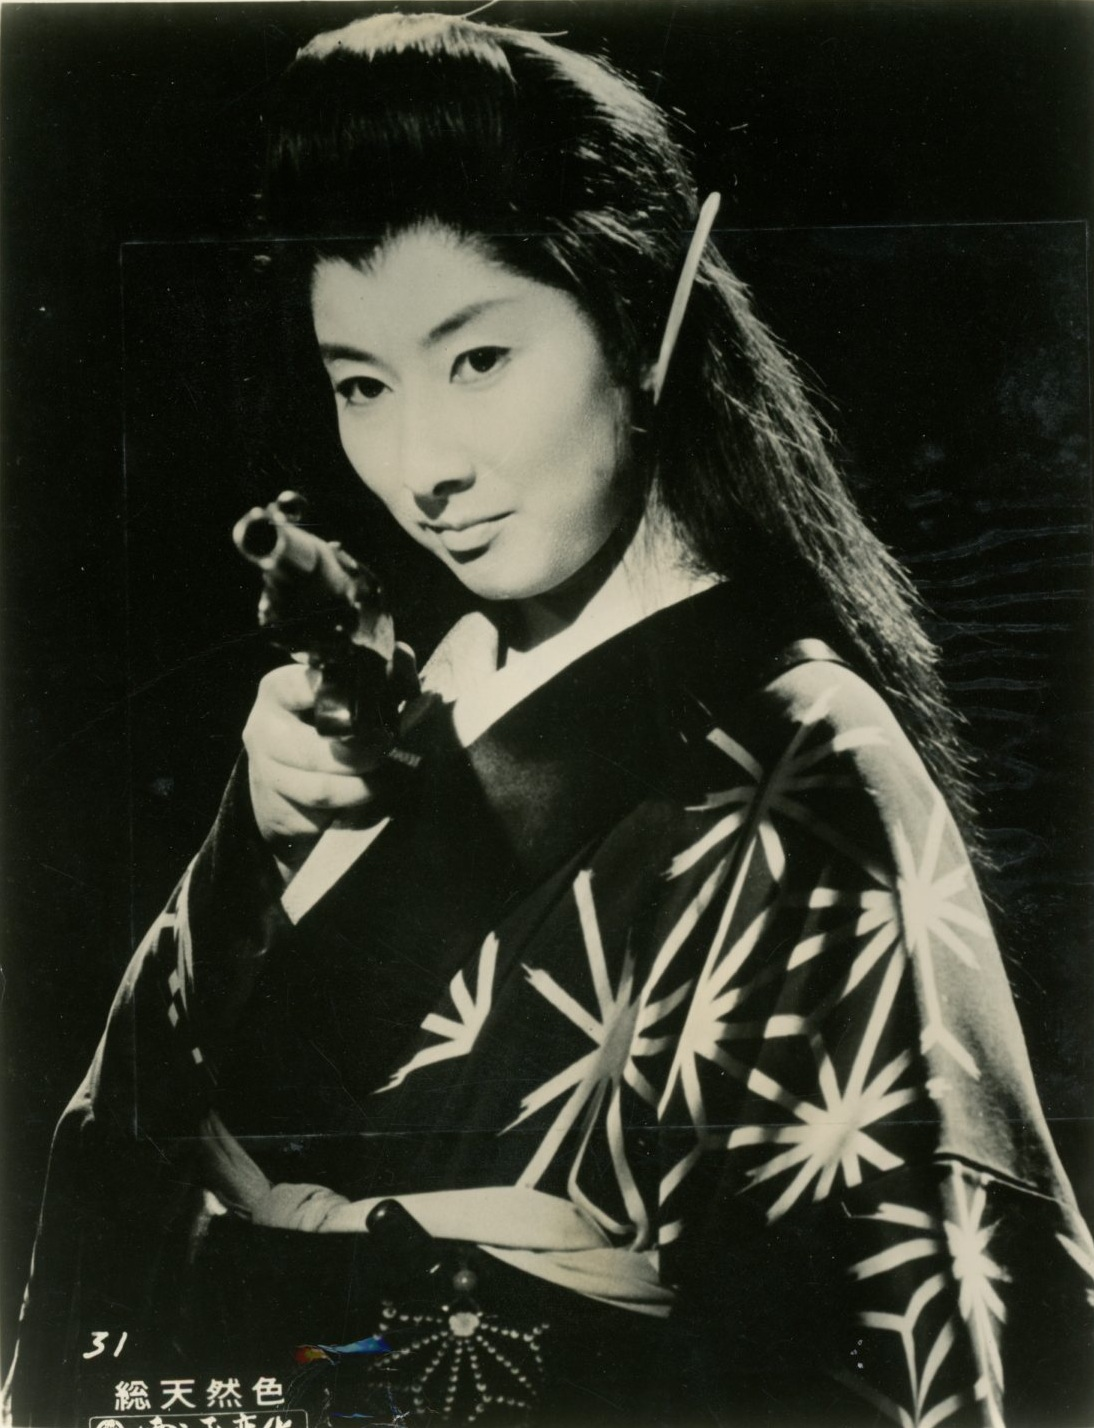 Communication on this topic: Selina Lo, fujiko-yamamoto/